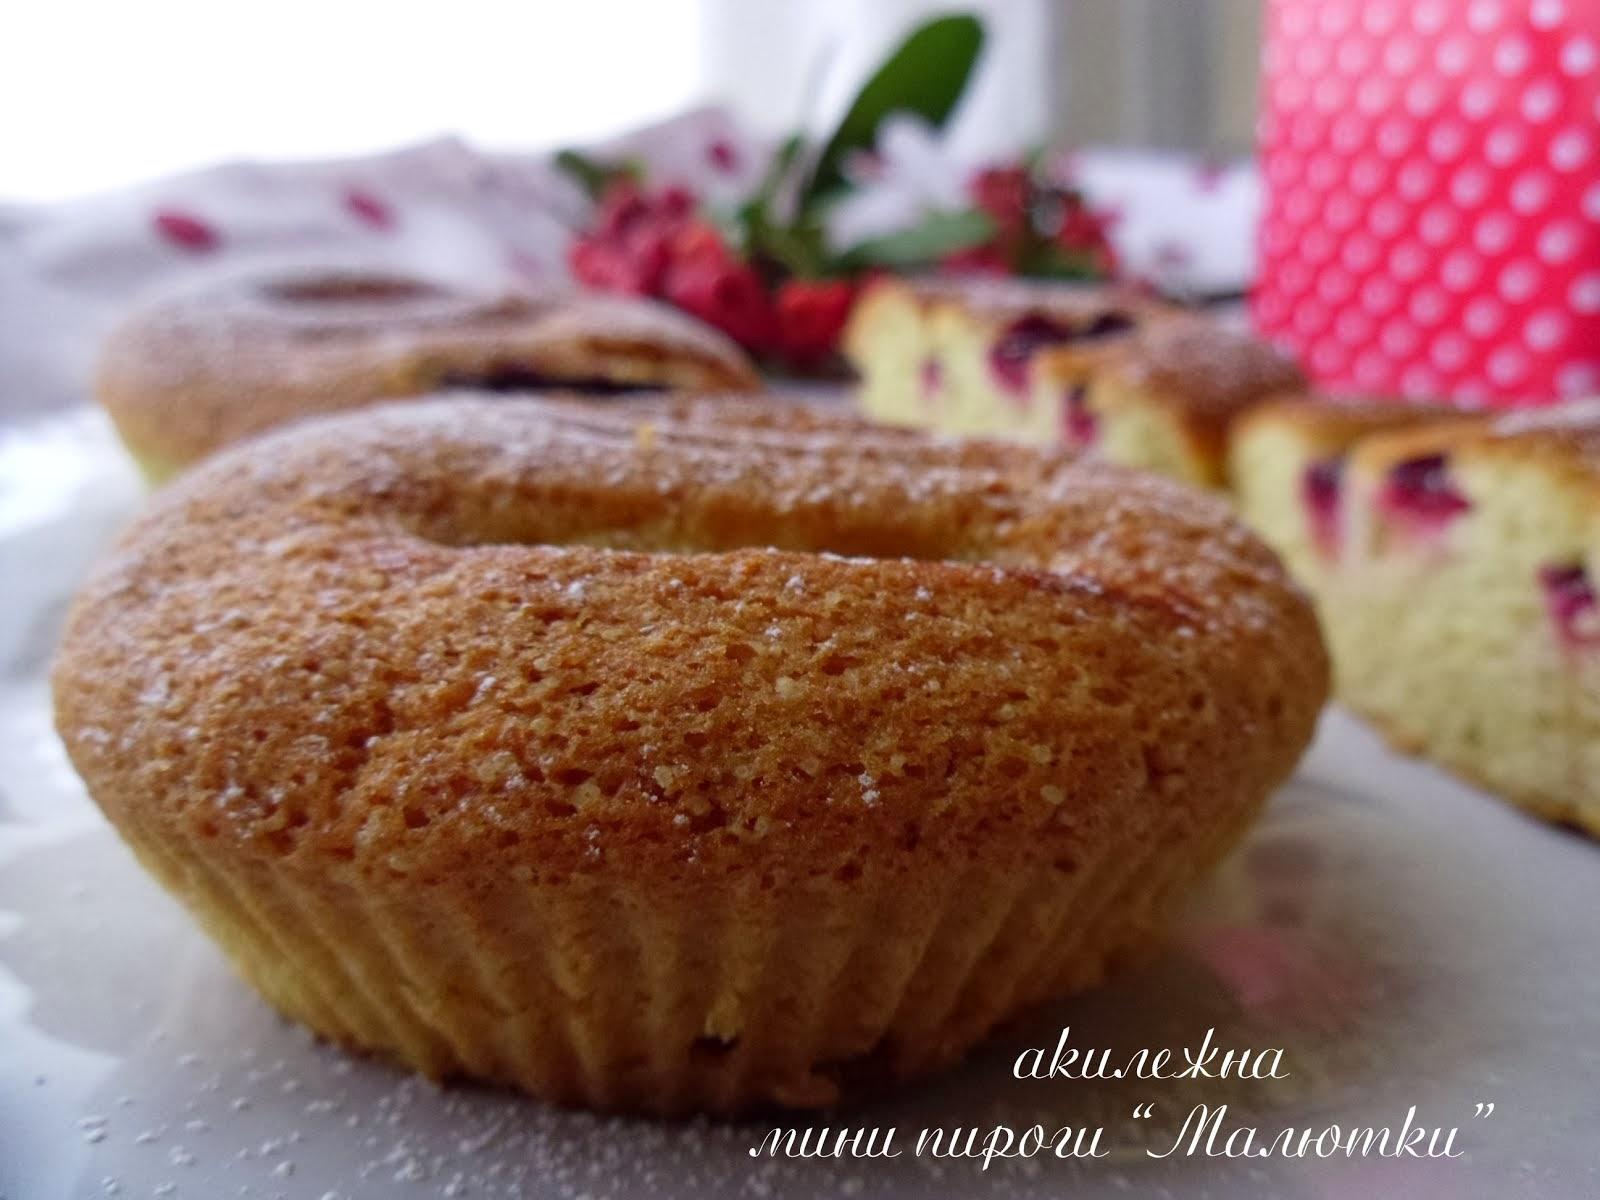 Мини пироги «Малютки»